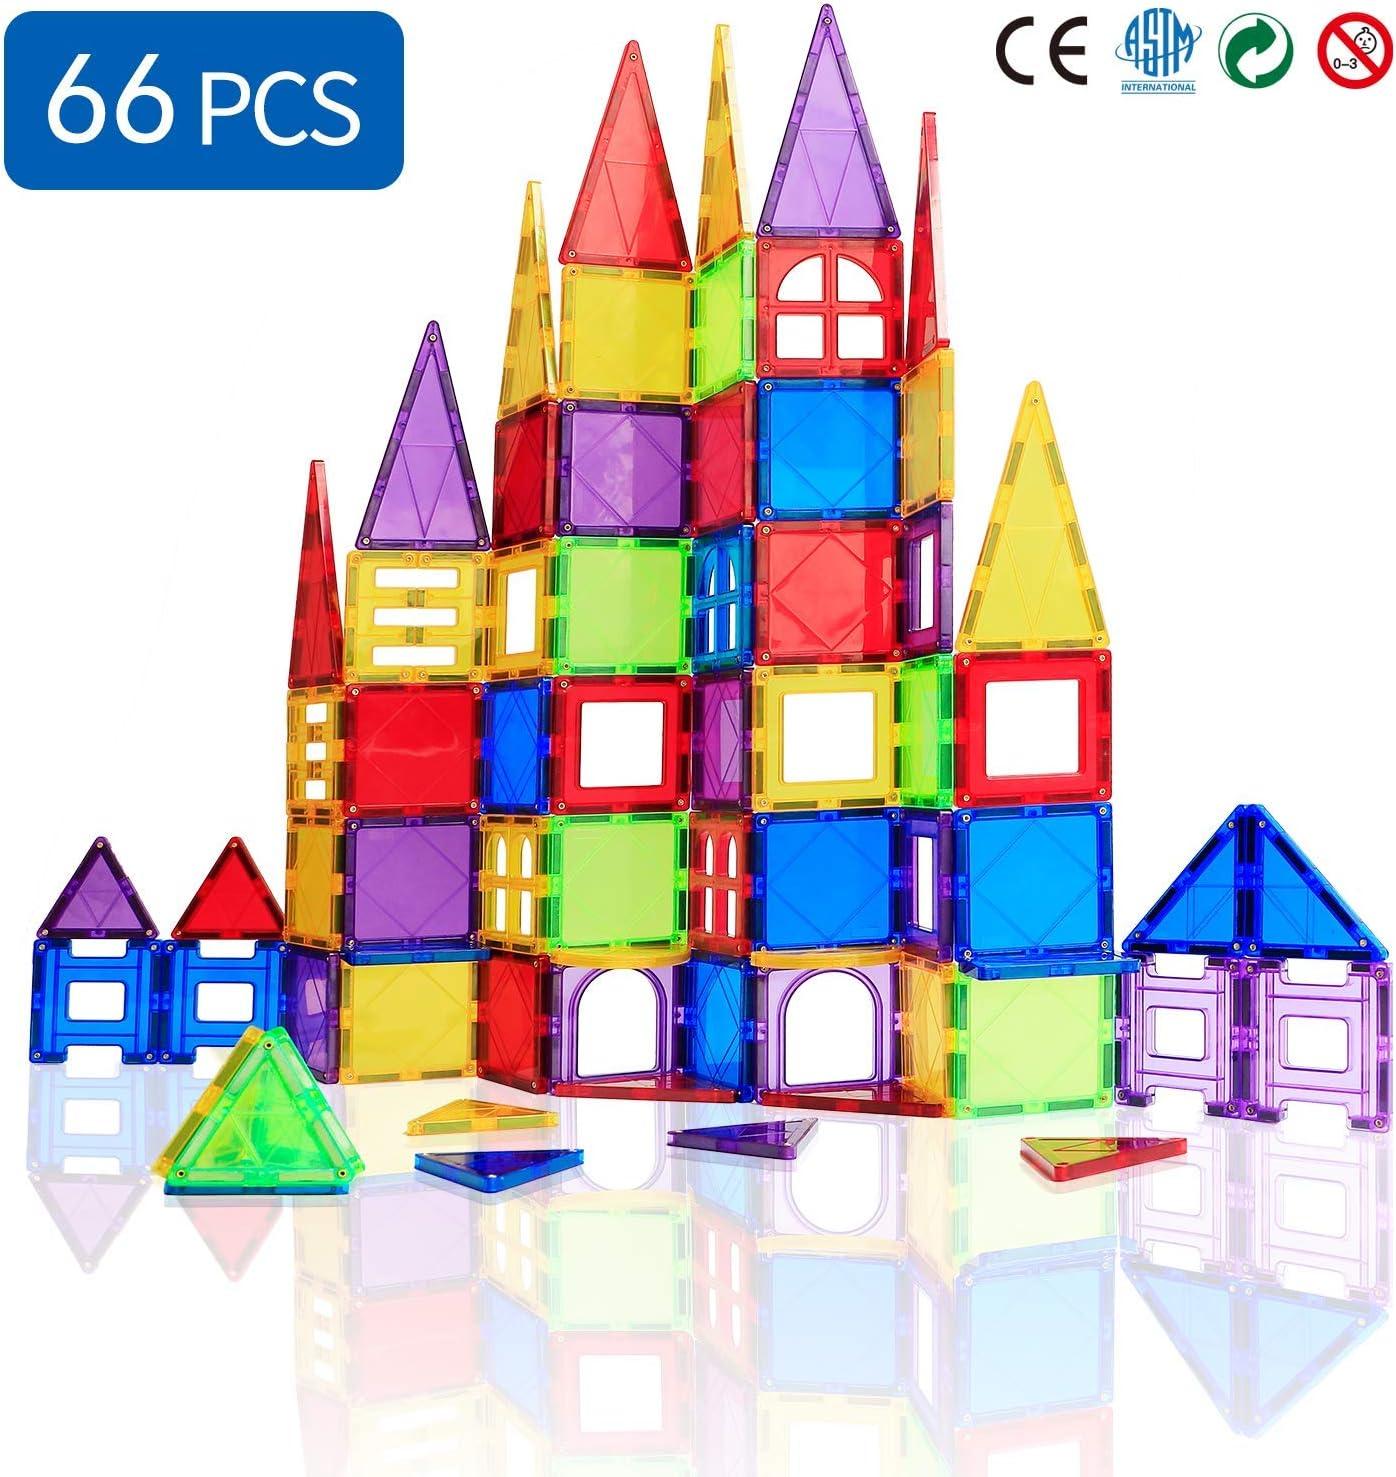 Jacksonville Mall New item Magblock 66 PCS Magnetic Building Tiles Blocks Kid for